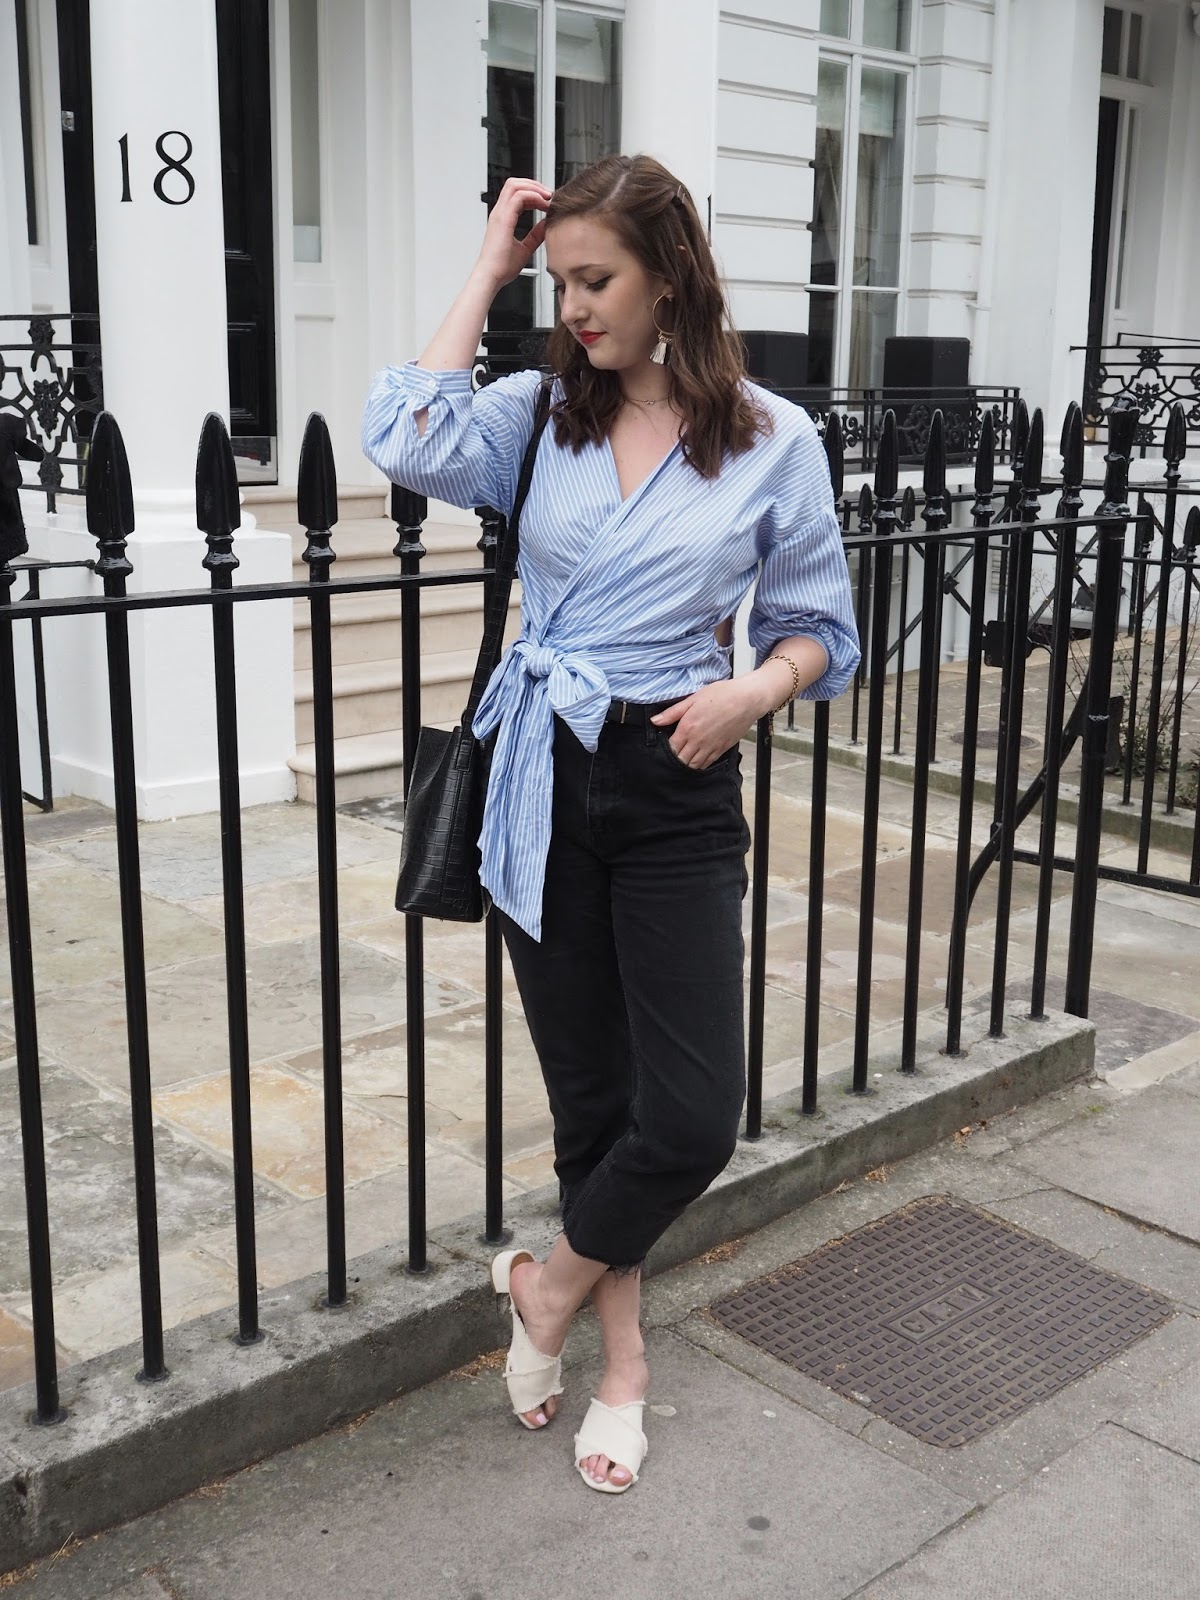 The Zara Wrap Top / Lauren Rose Style Blog Fashion London // Street Style OOTD